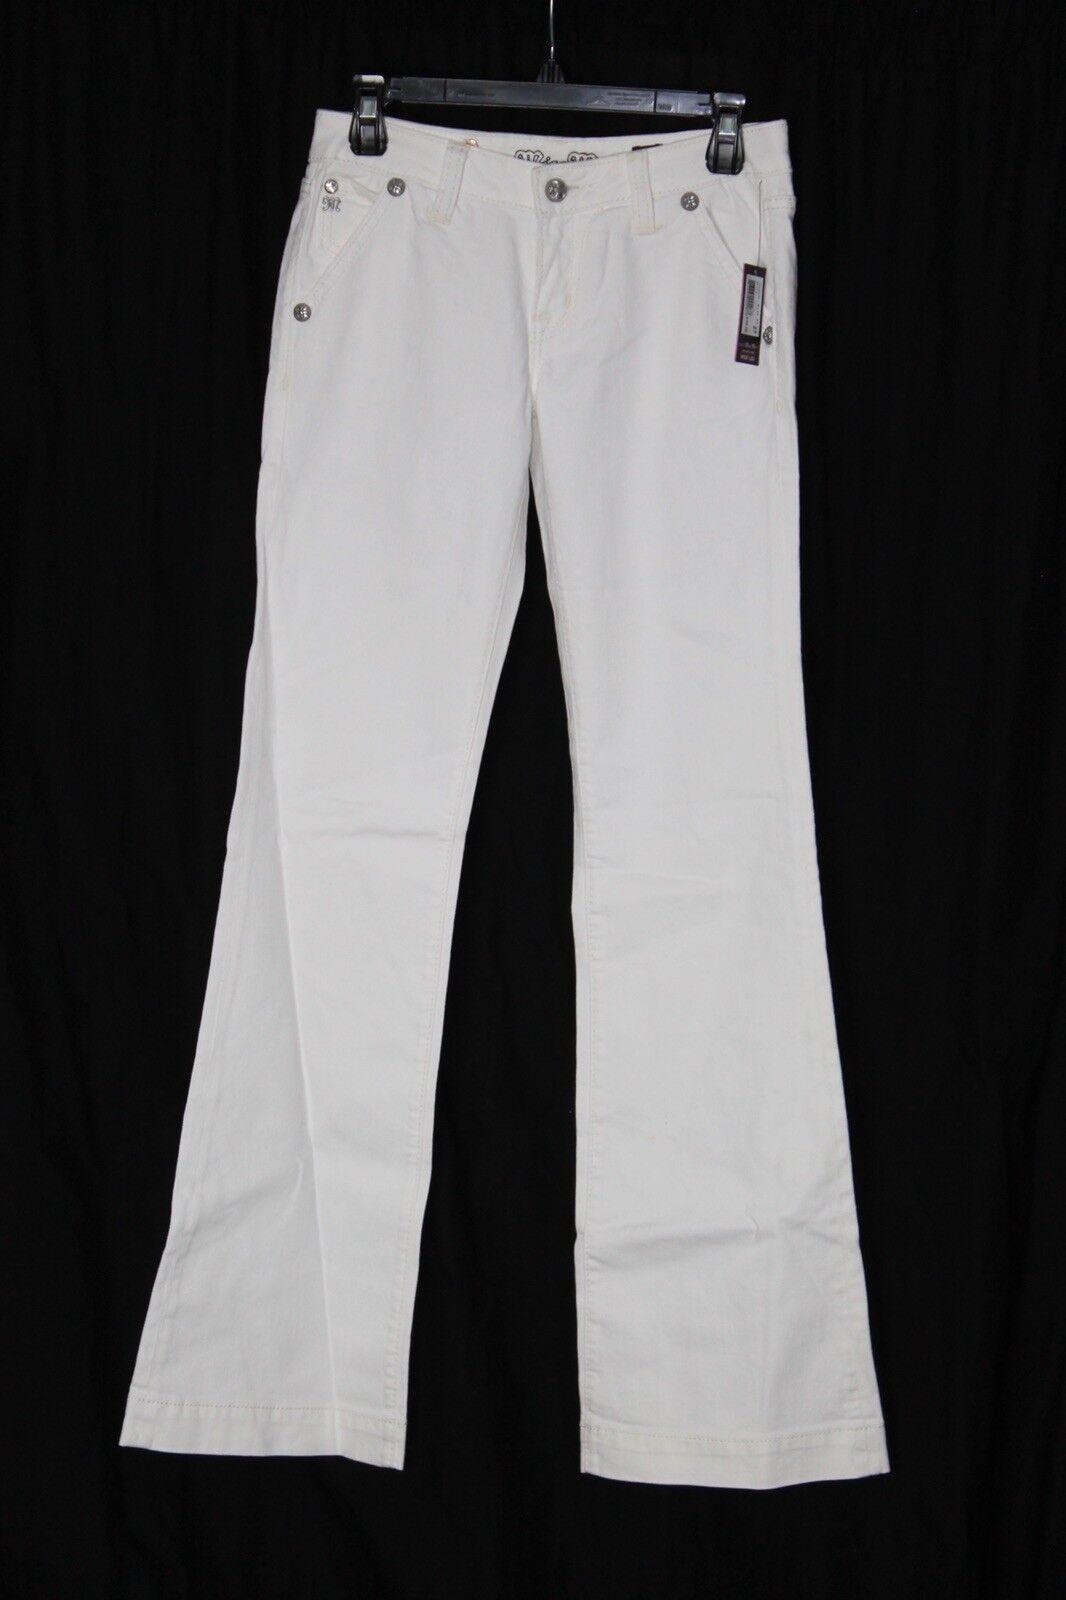 Miss Me White Jeans Wide Leg Size 27 JS4481W3 Zip Front P4